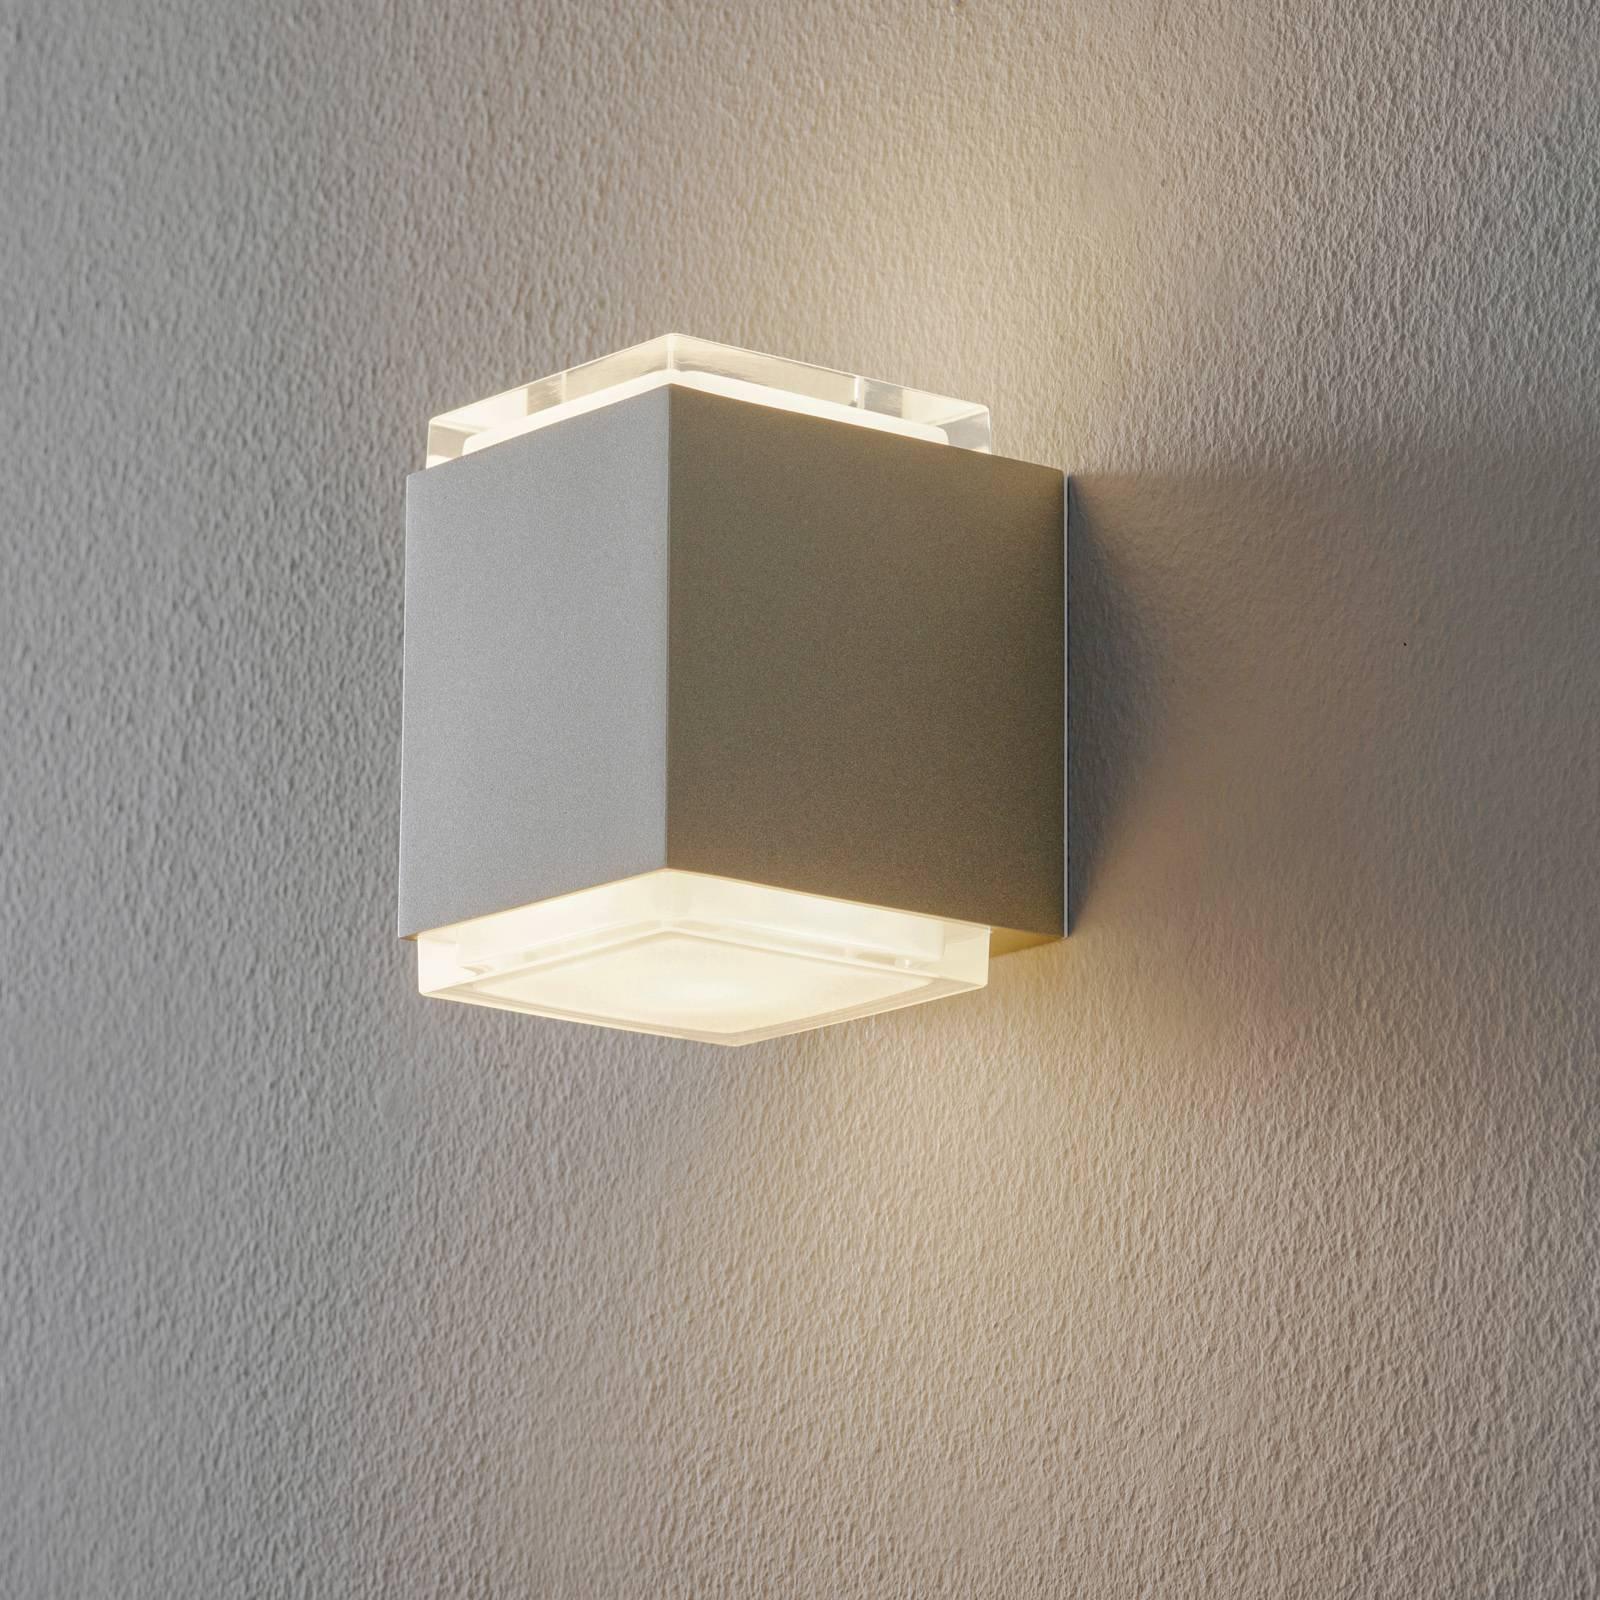 BEGA 50063 LED-vegglampe 3 000 K 9 cm palladium